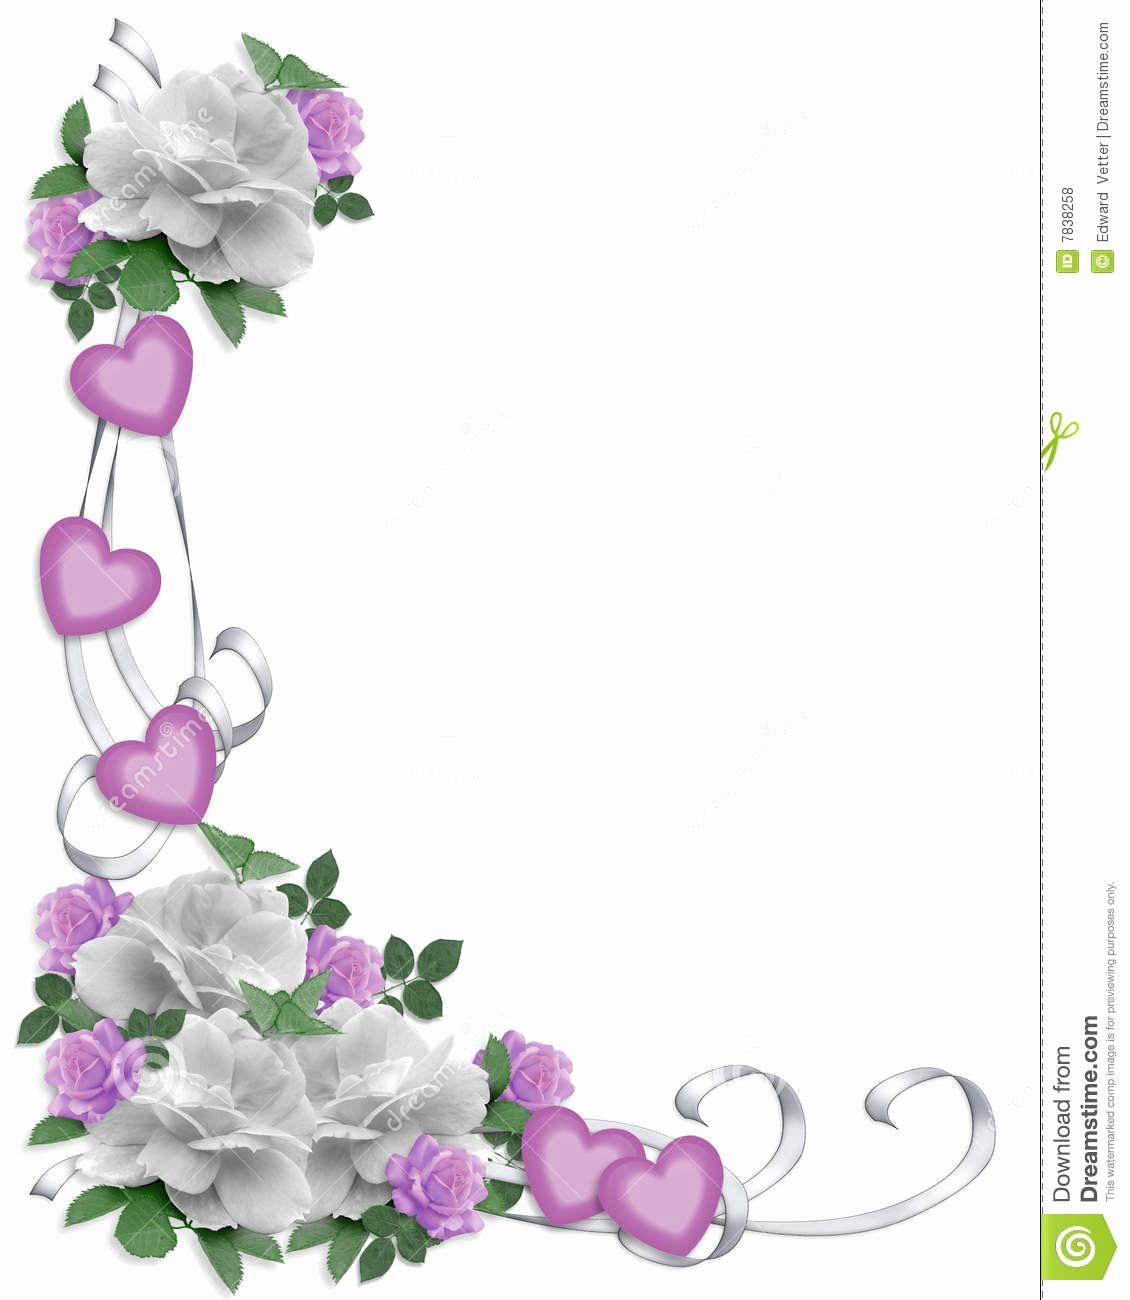 Wedding Invitation Borders Design Inspirational Wedding Invitation Border White Roses